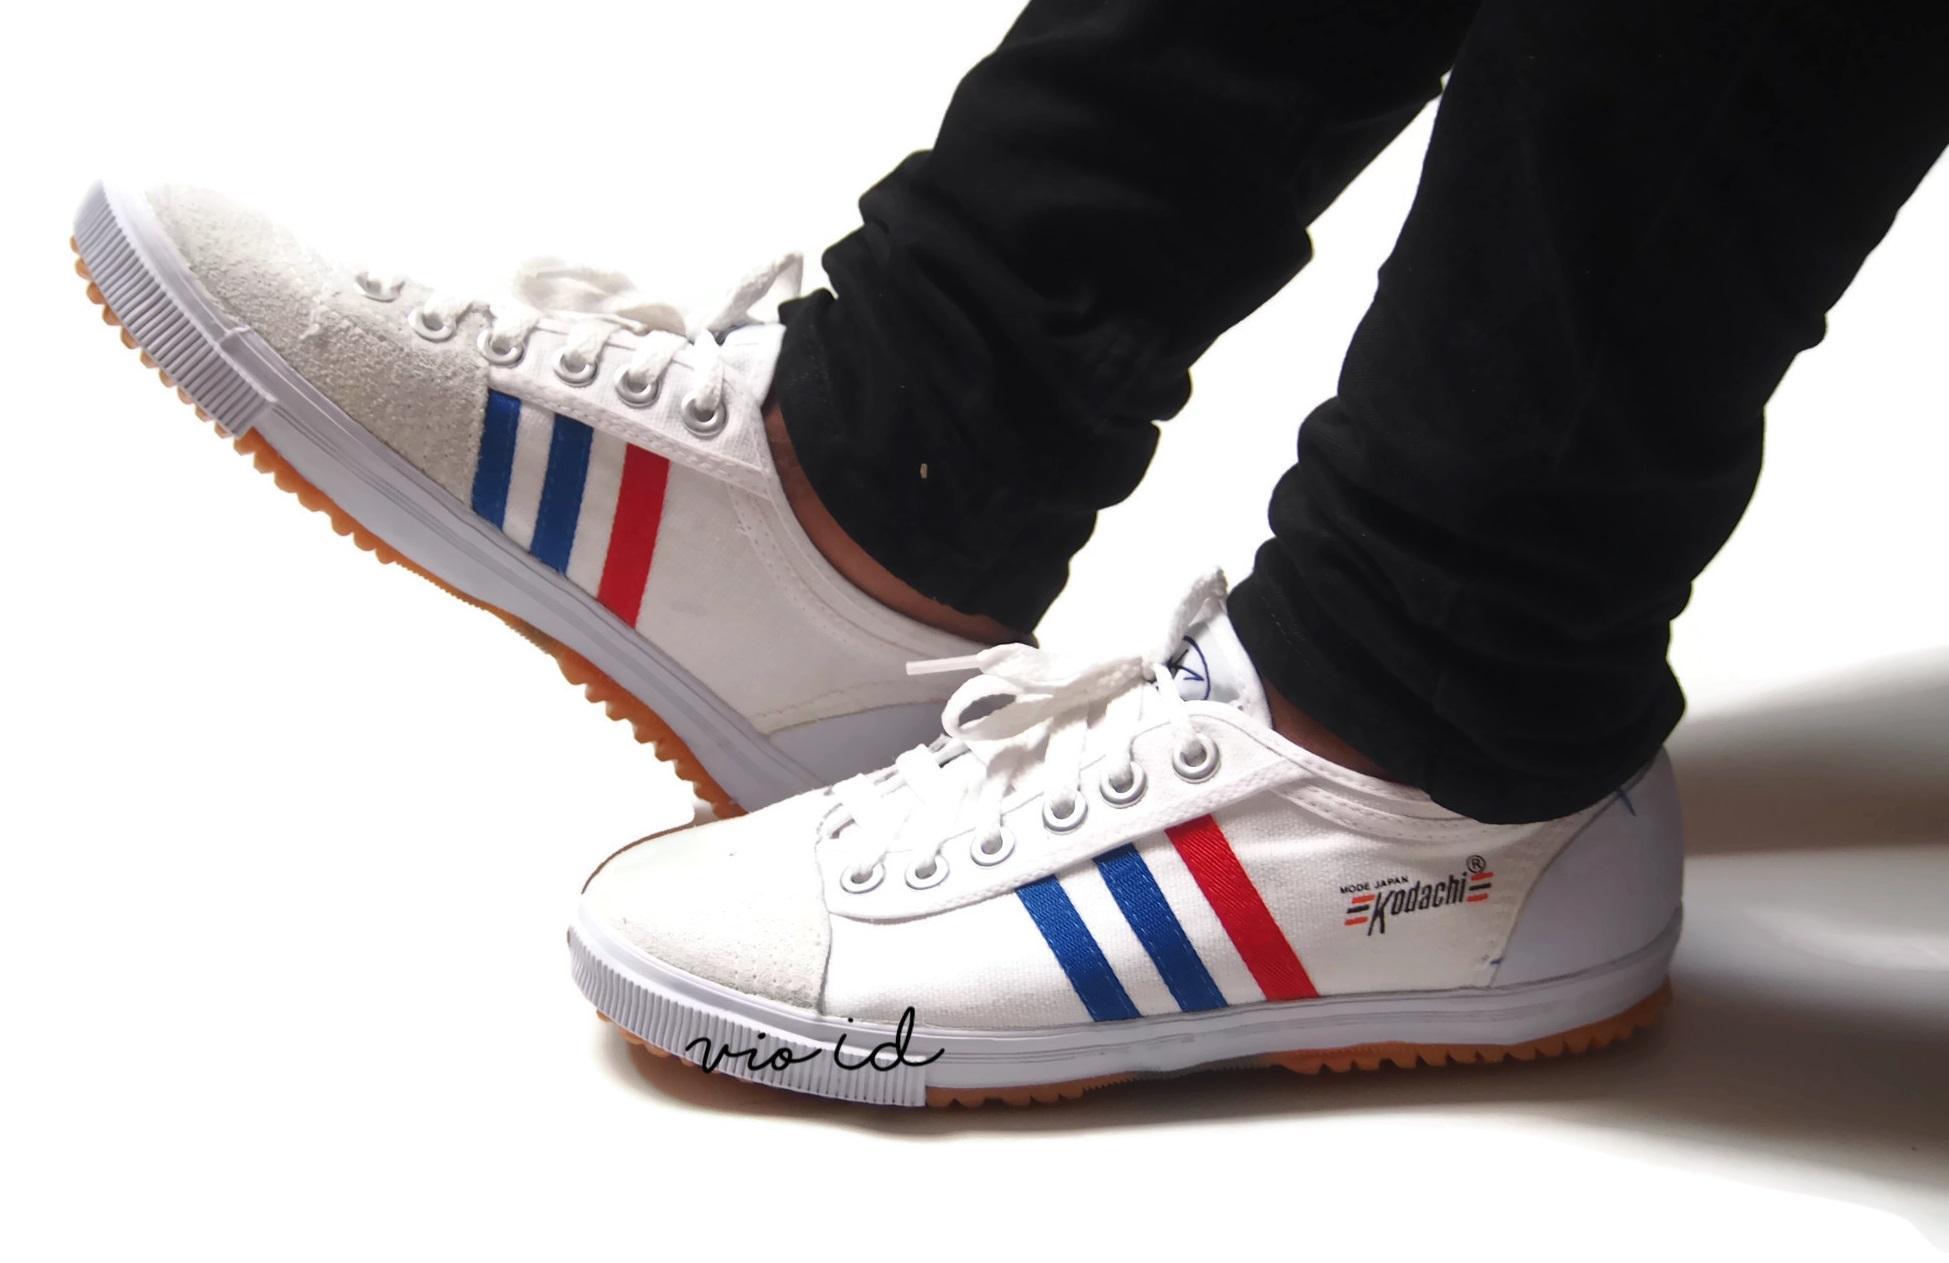 ... Sepatu Kodachi 8111 - Sepatu Olahraga Import Stripe Putih - 5